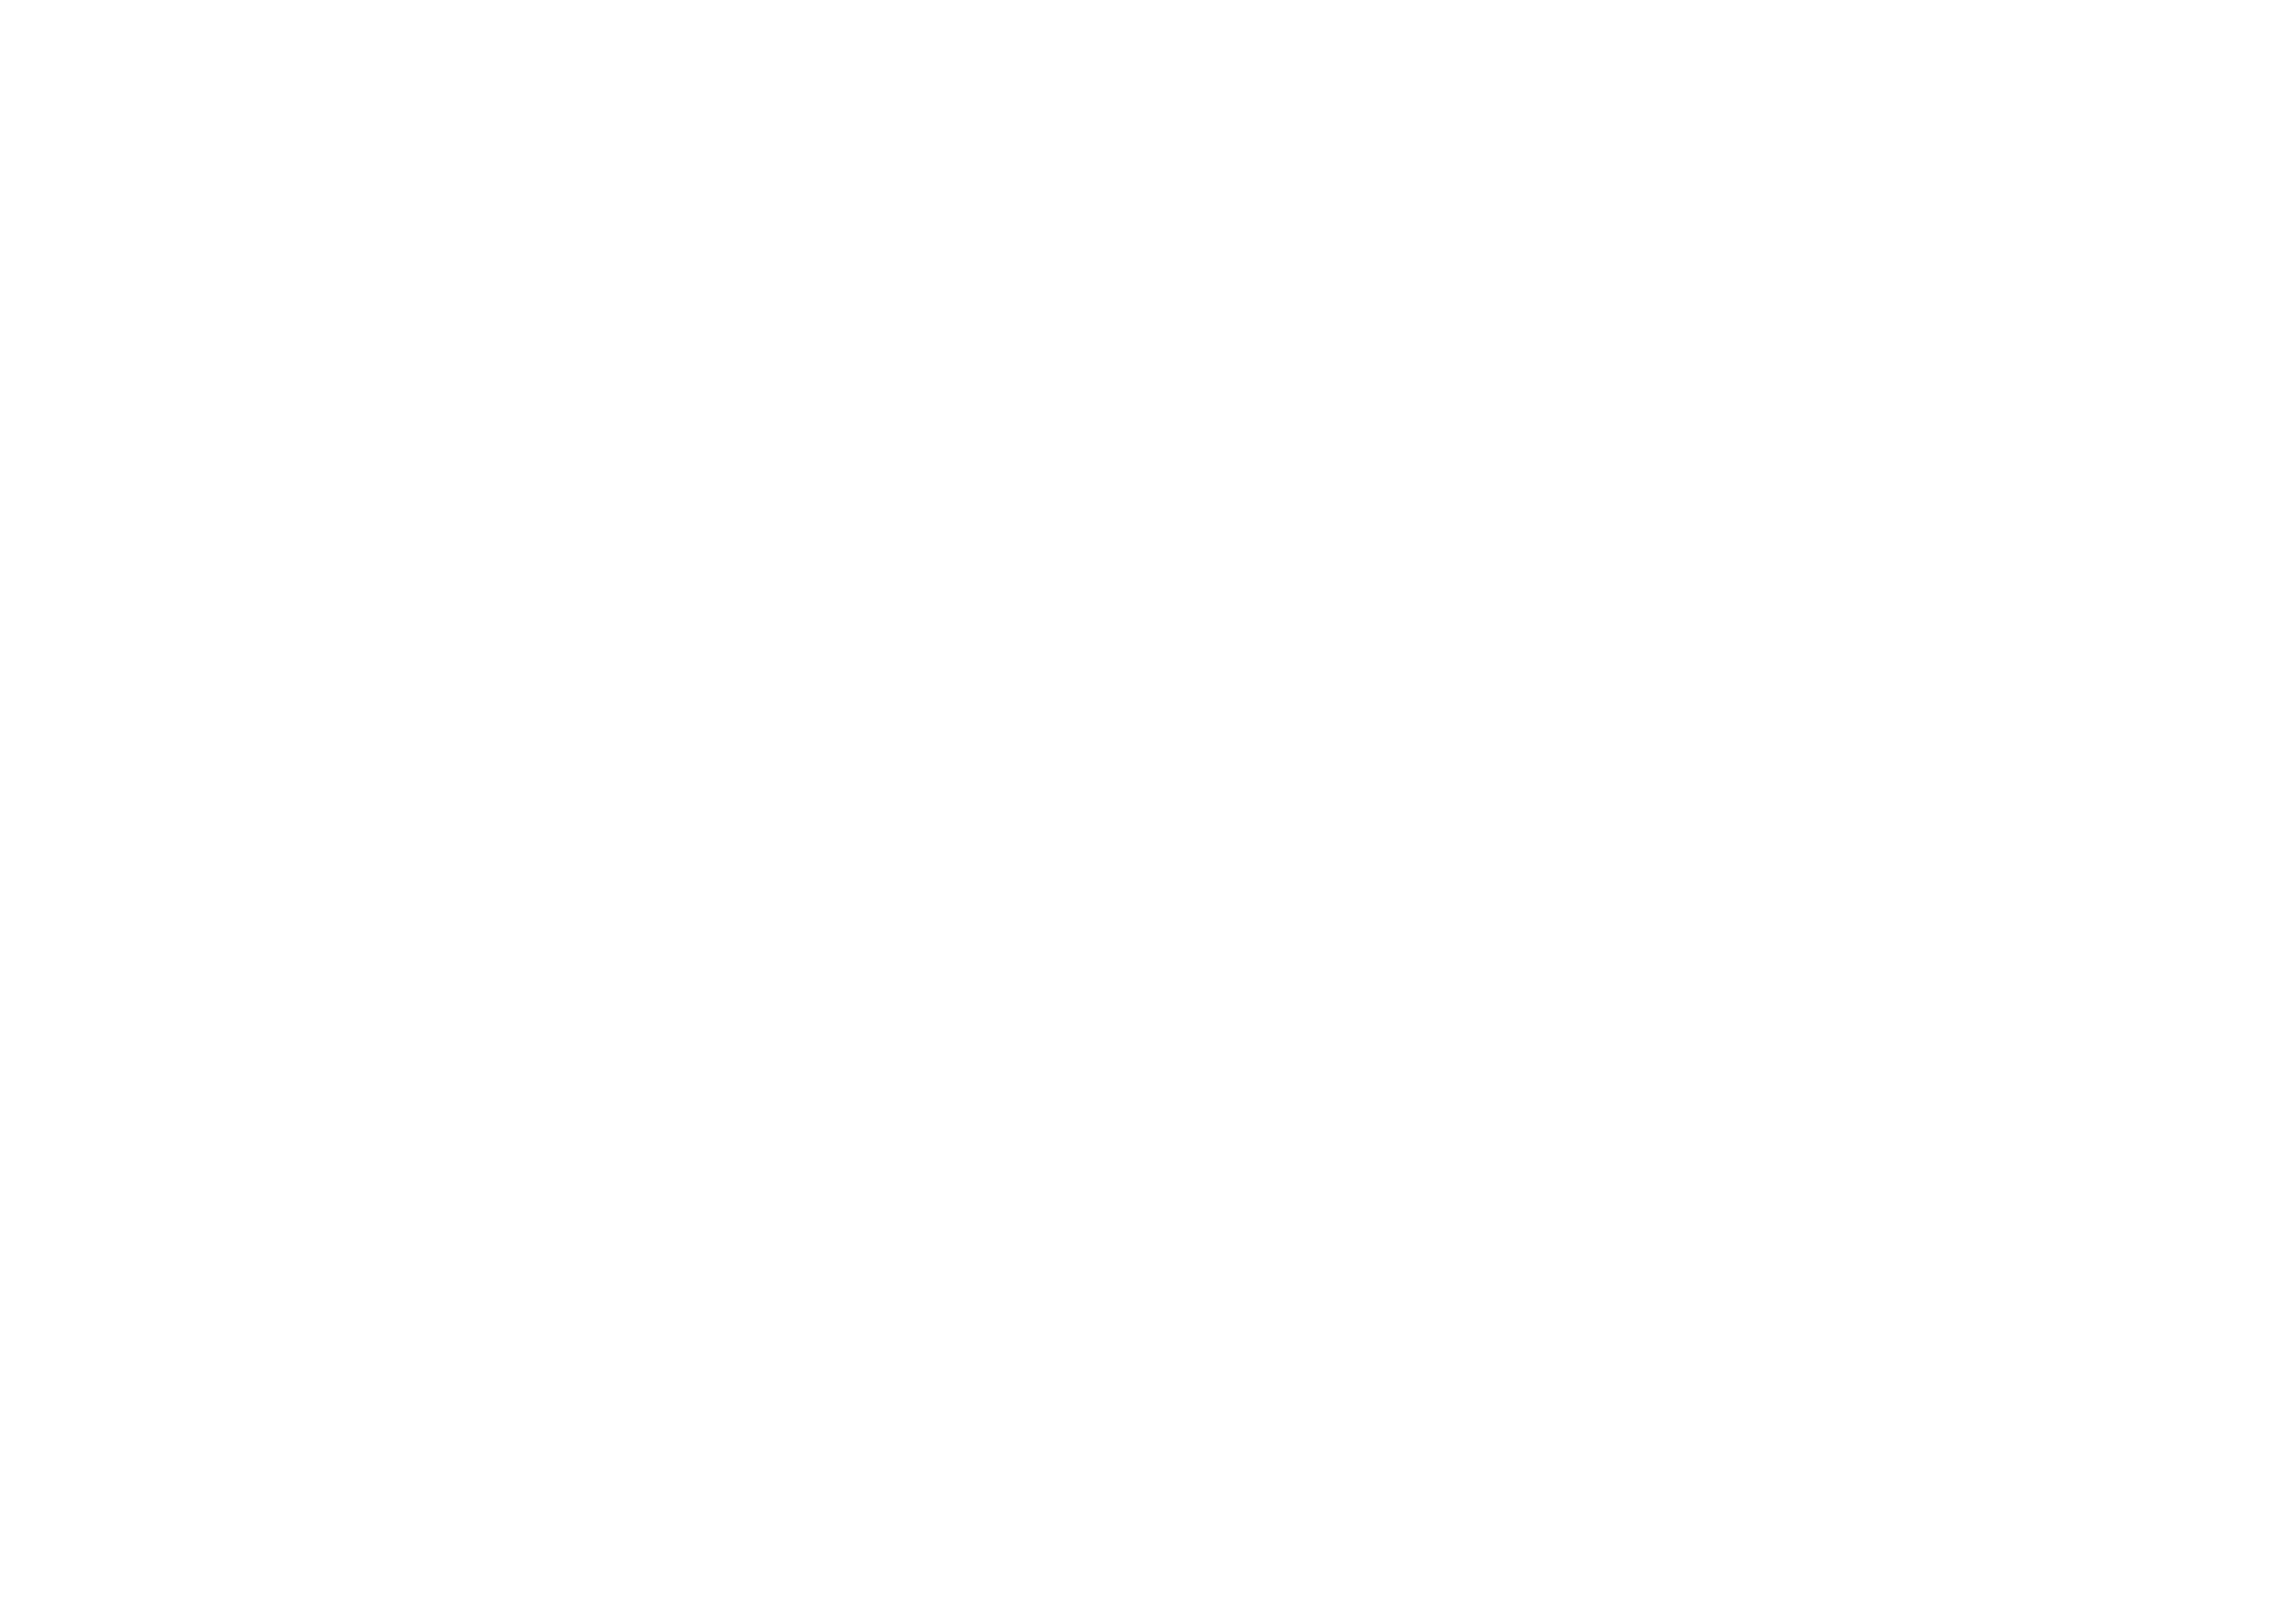 L'oeil du Yak